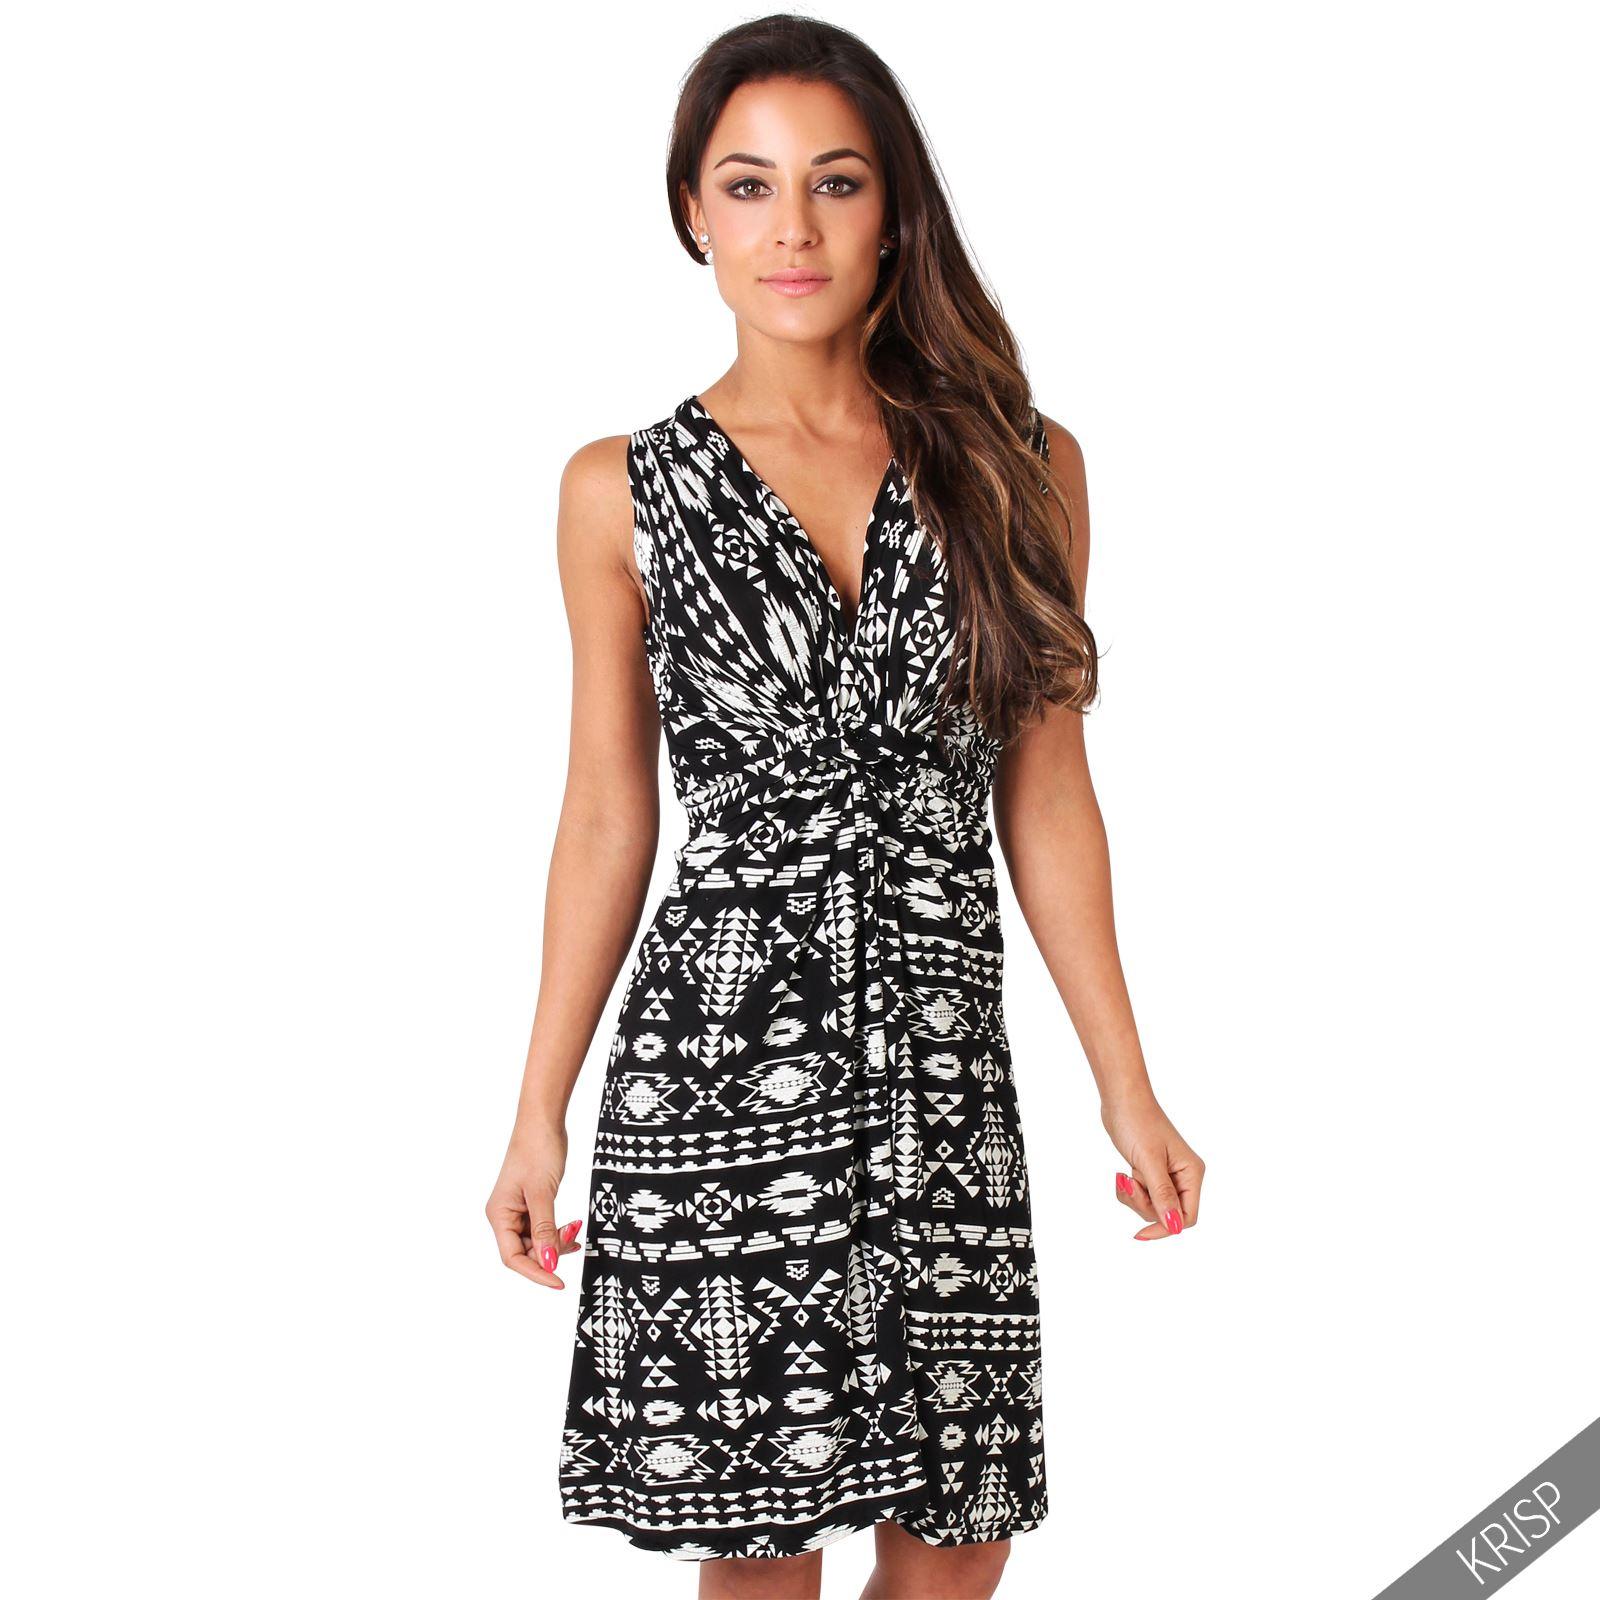 Womens-V-Neck-Mini-Dress-Small-Sizes-Short-Skirt-Tribal-Print-Front-Knot-Party thumbnail 6